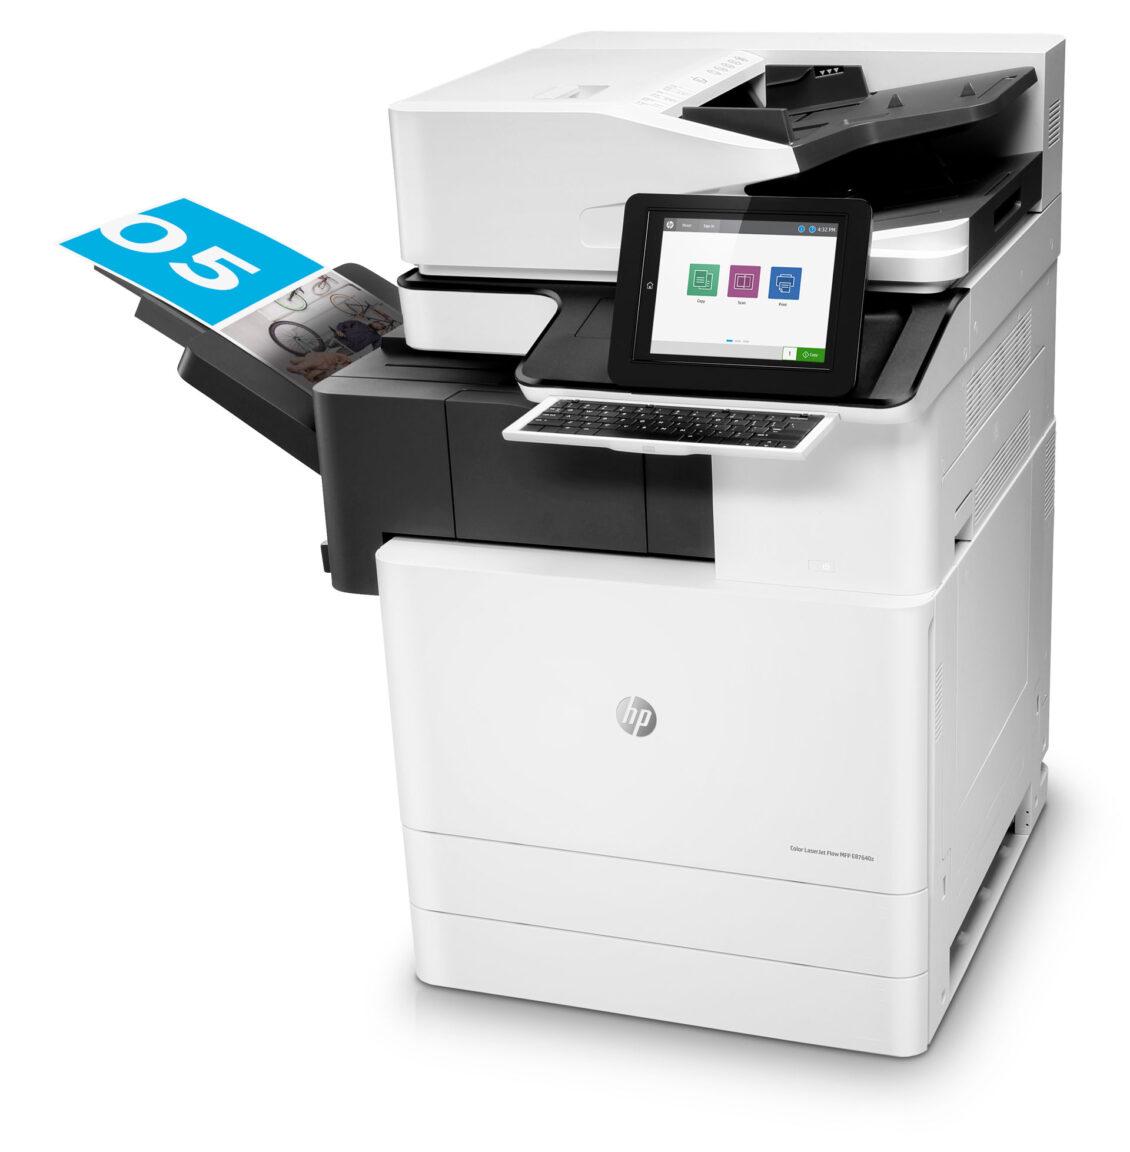 HP Multifunctional Printer